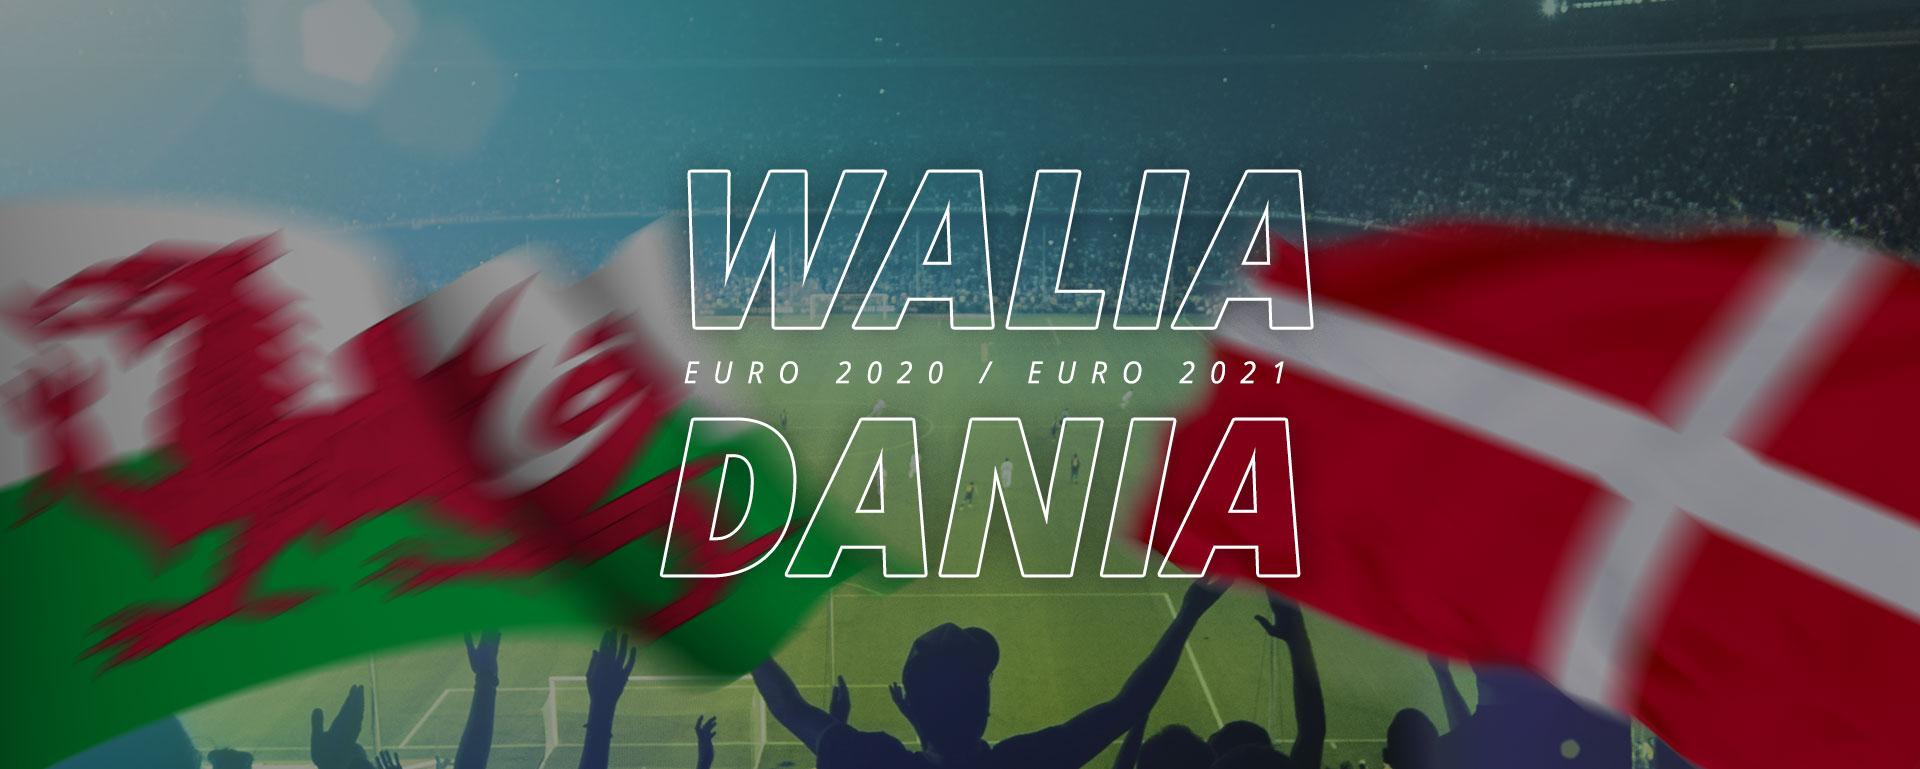 Walia – Dania | 1/8 finału Euro 2020 / Euro 2021